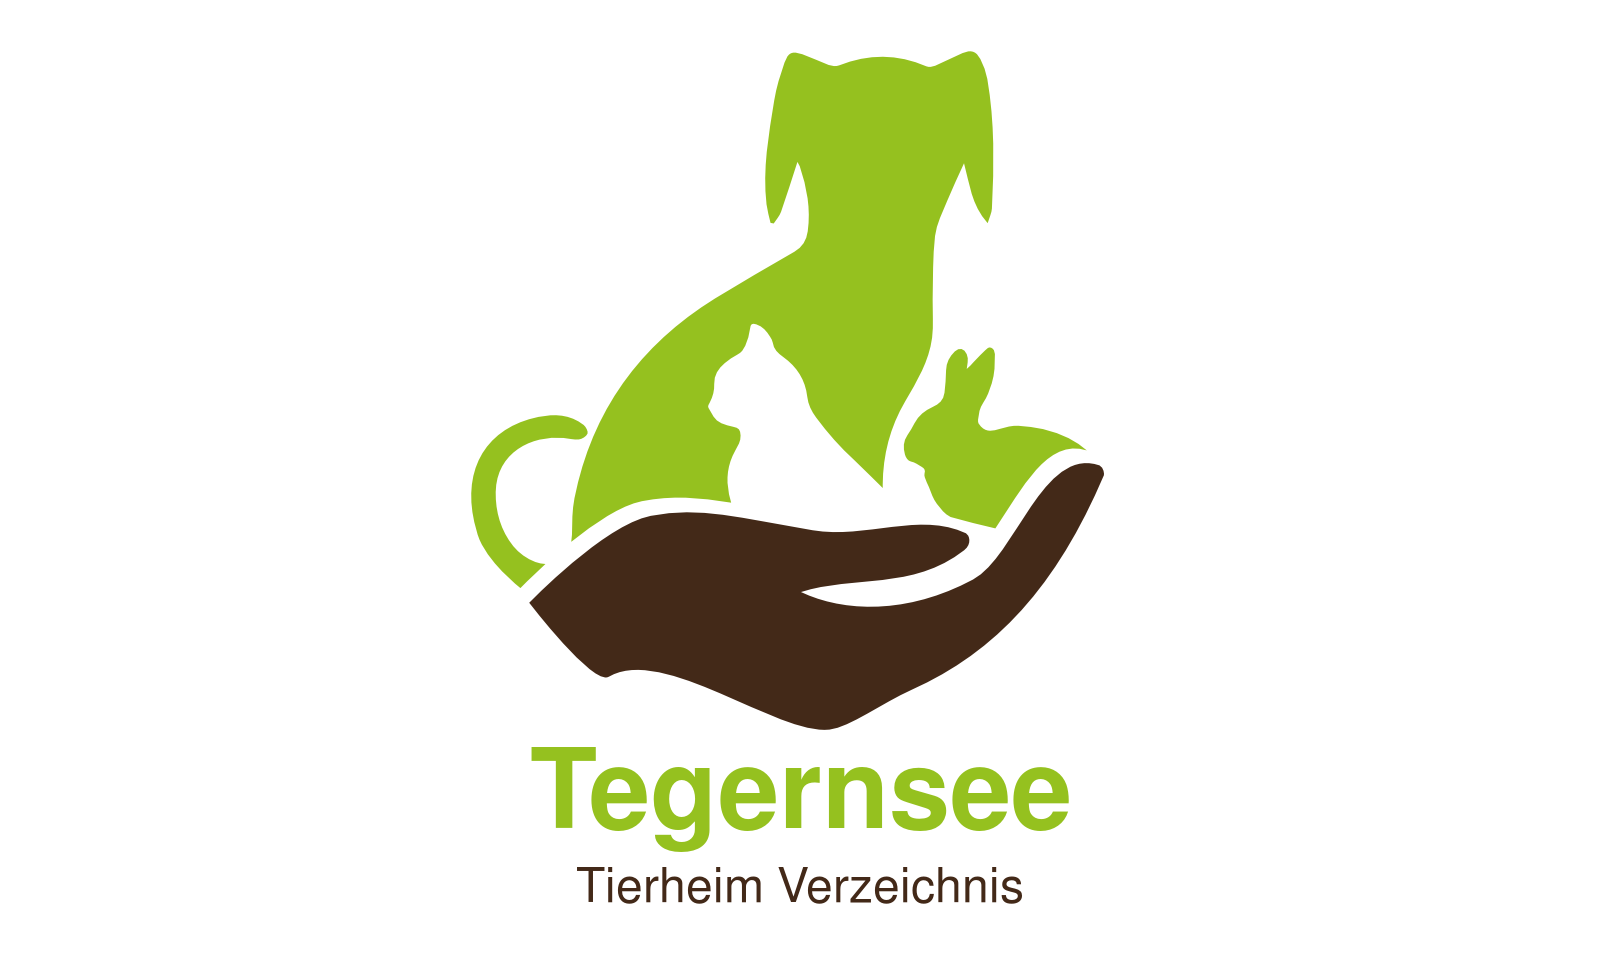 Tierheim Tegernsee